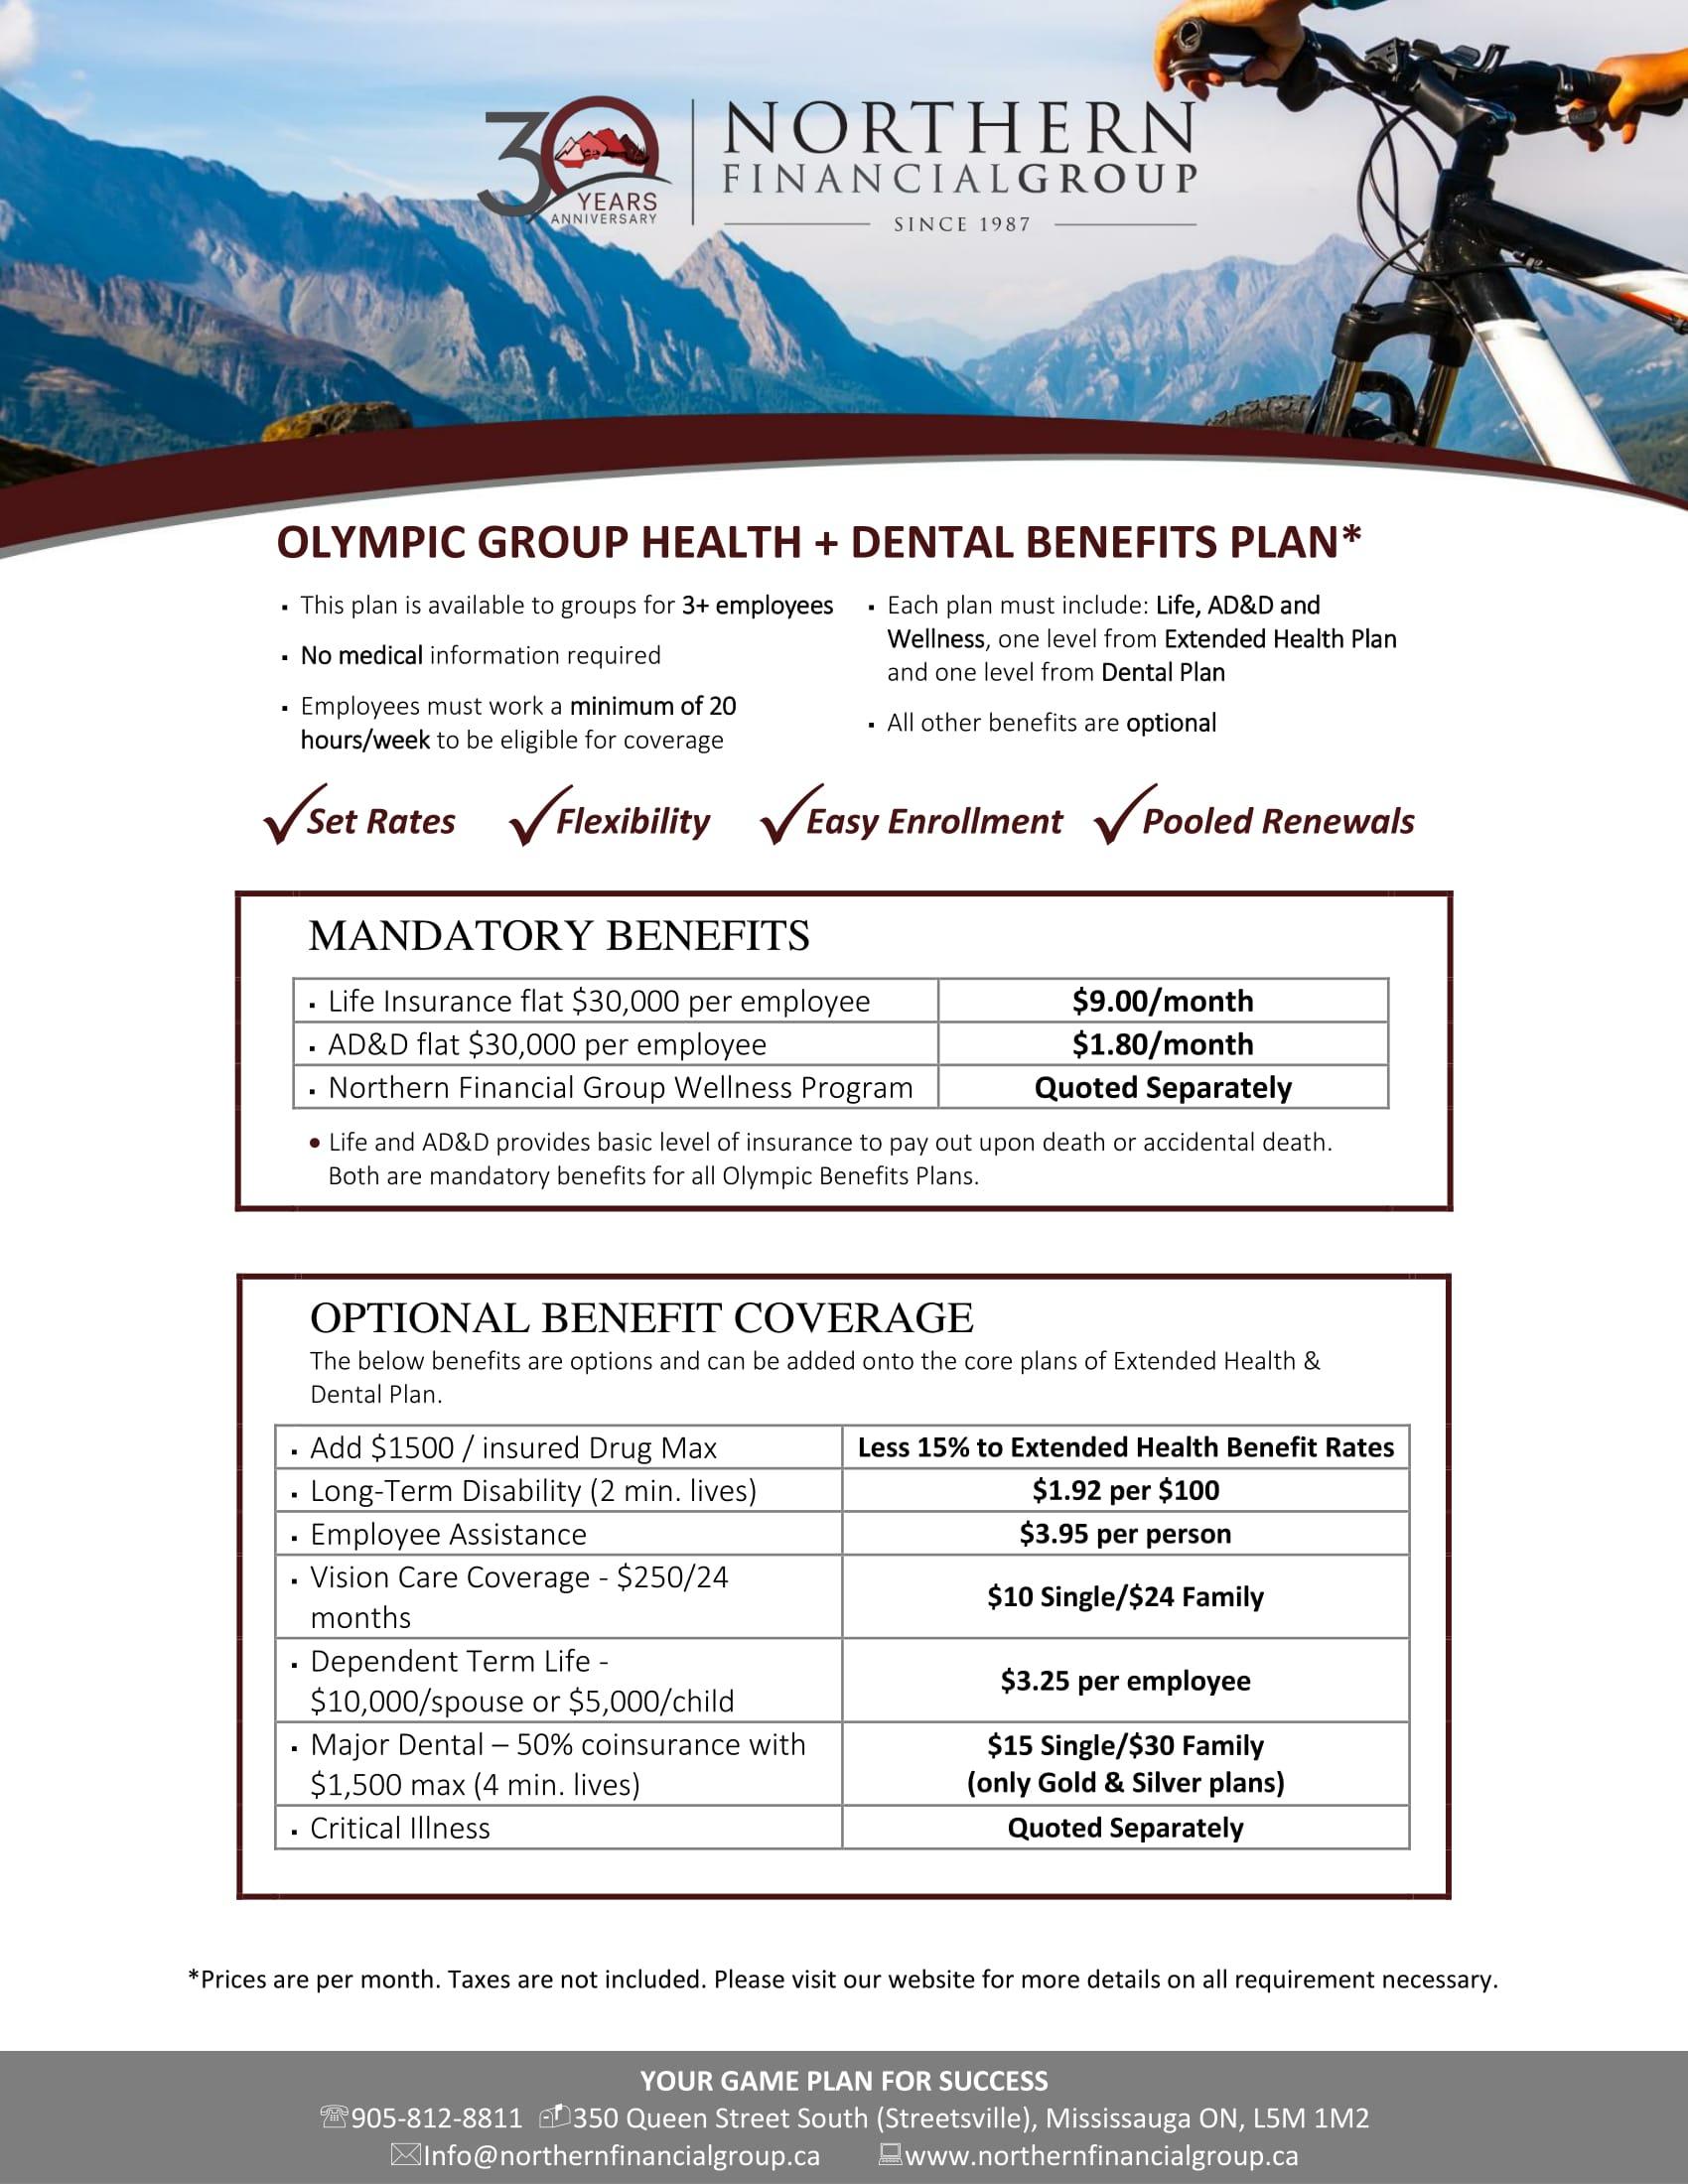 Olympic Group Benefits Plan Design Drug/Health Coverage and Dental Plans